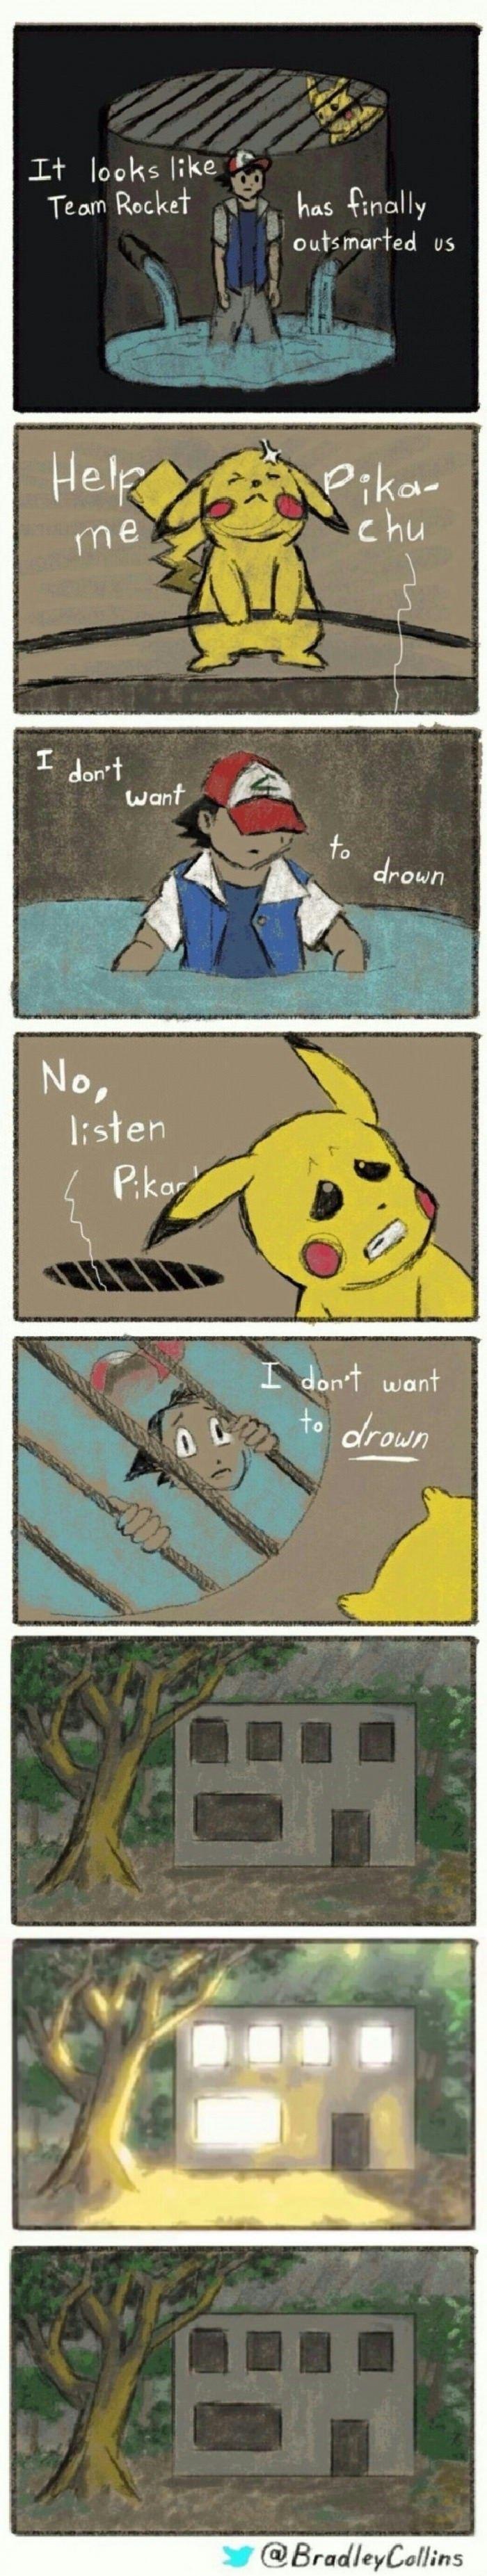 30 Brutally Dark Memes Comics For Your Twisted Entertainment Memebase Funny Memes Dark Memes Dark Pokemon Pokemon